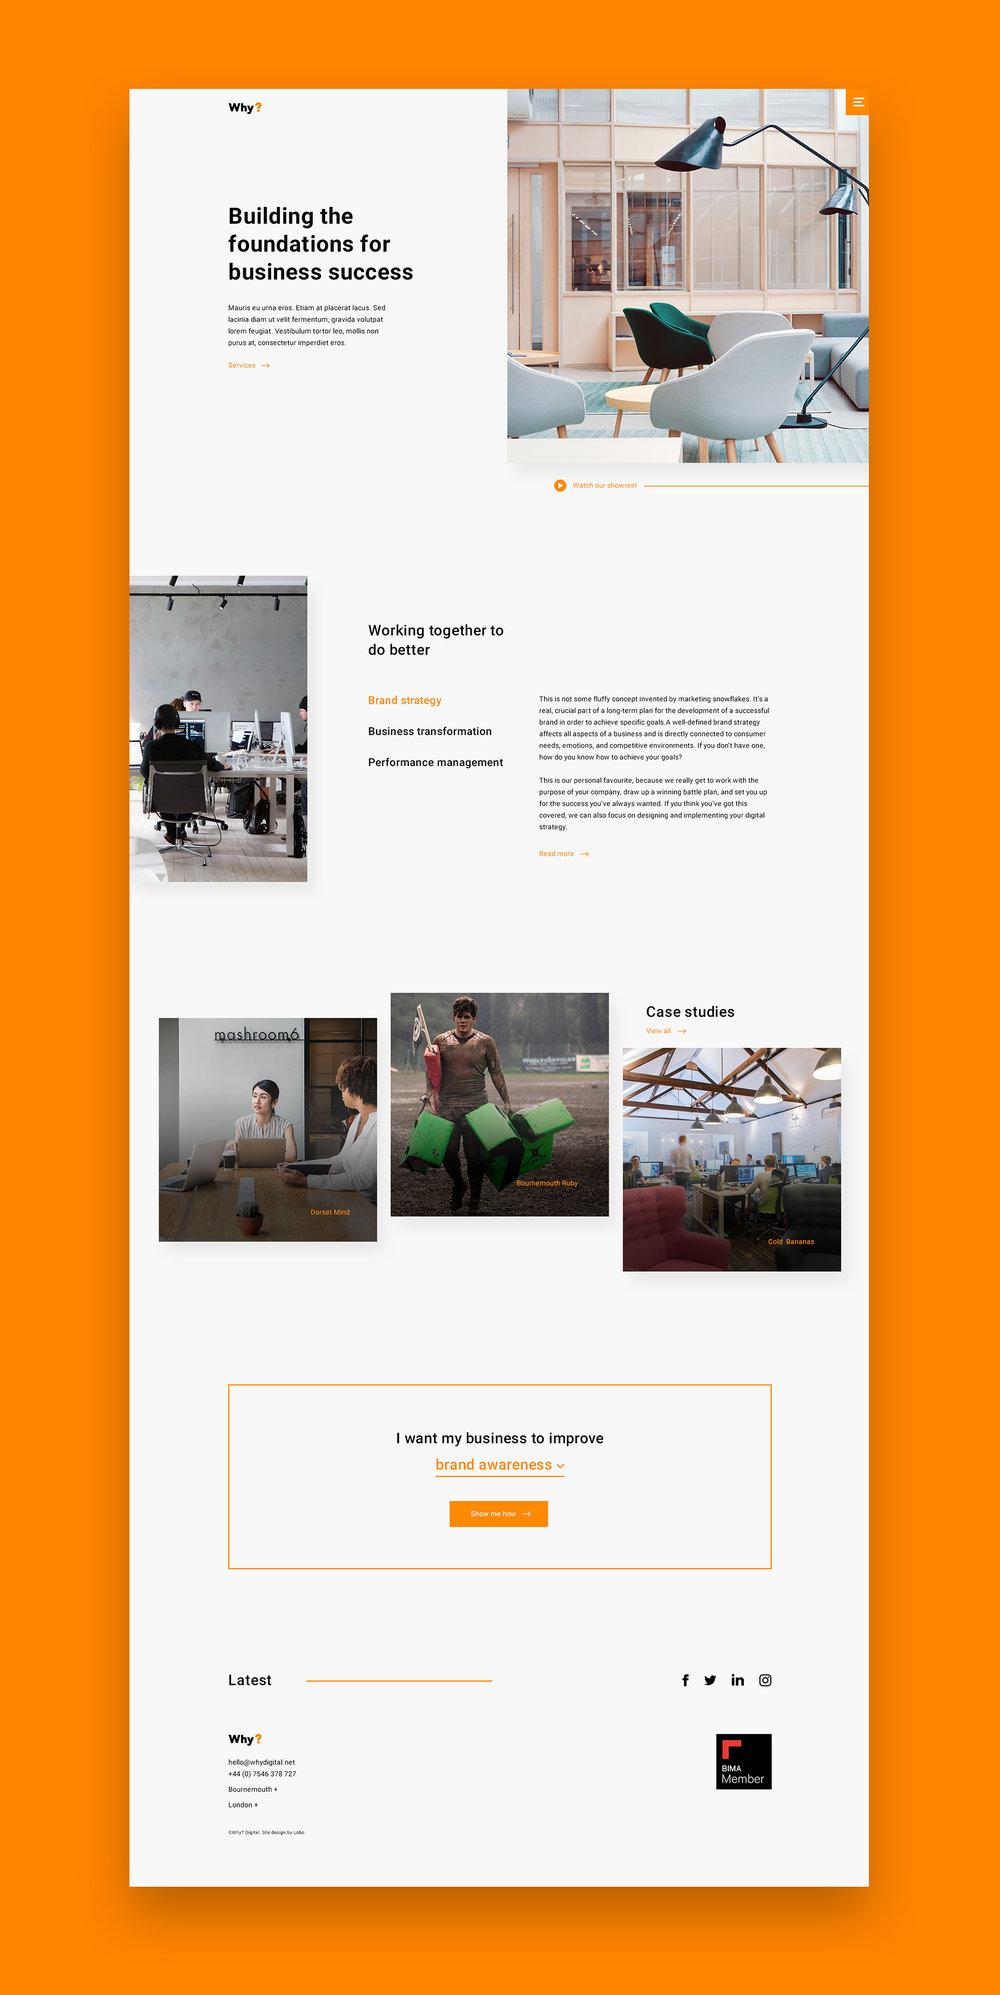 Lobo Creative - Why Digital - Bournemouth web design case study.jpg